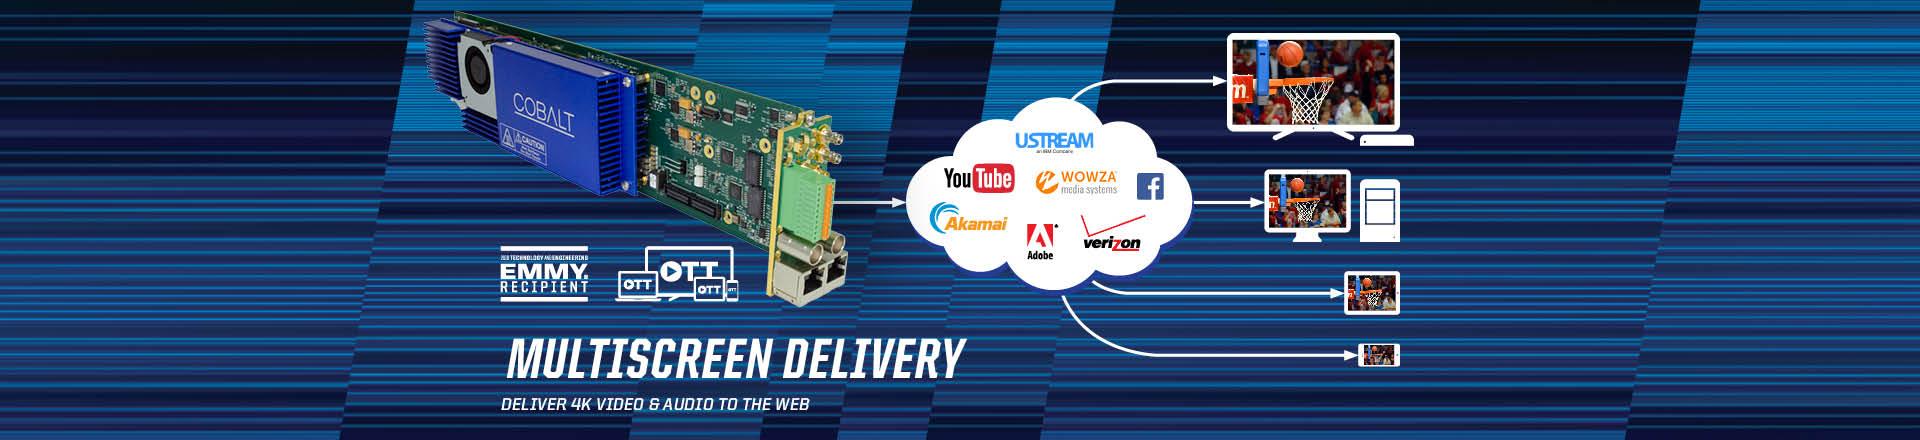 OTT Multiscreen Delivery